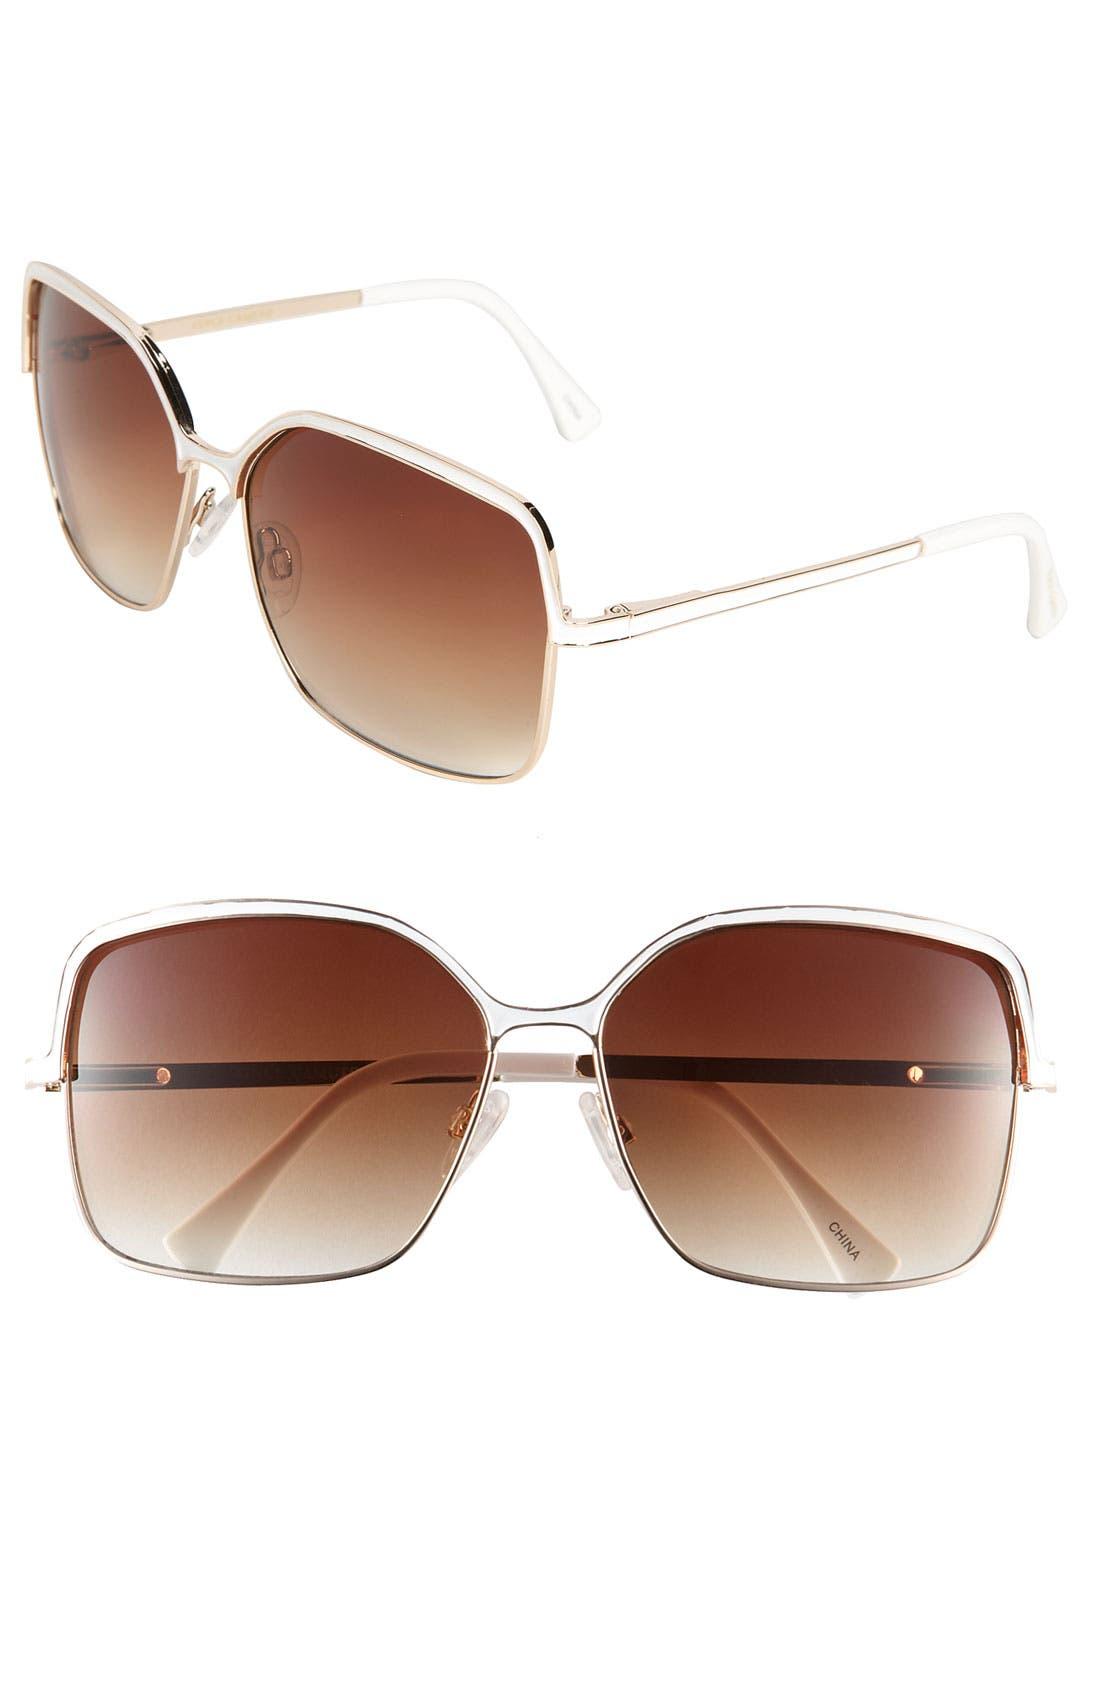 Main Image - Vince Camuto 60mm Square Metal Sunglasses